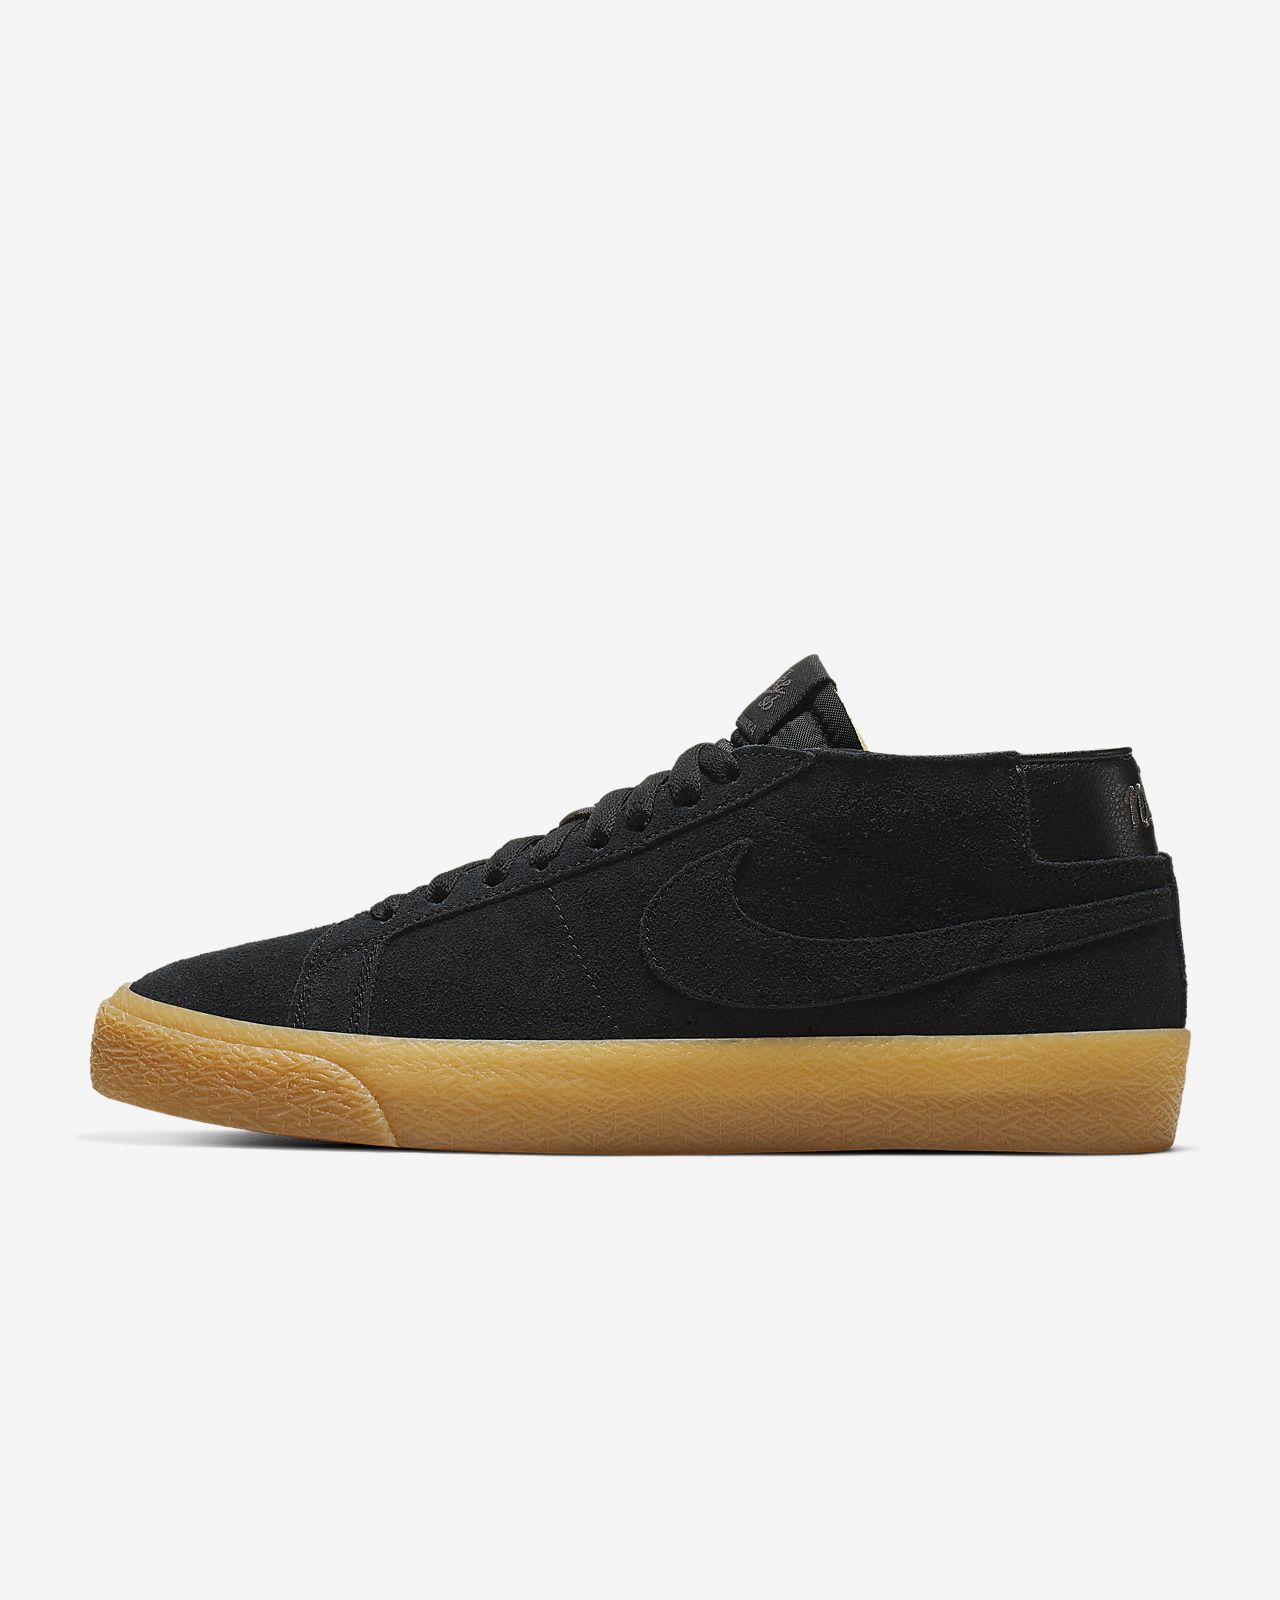 Nike SB Zoom Blazer Chukka Herren-Skateboardschuh